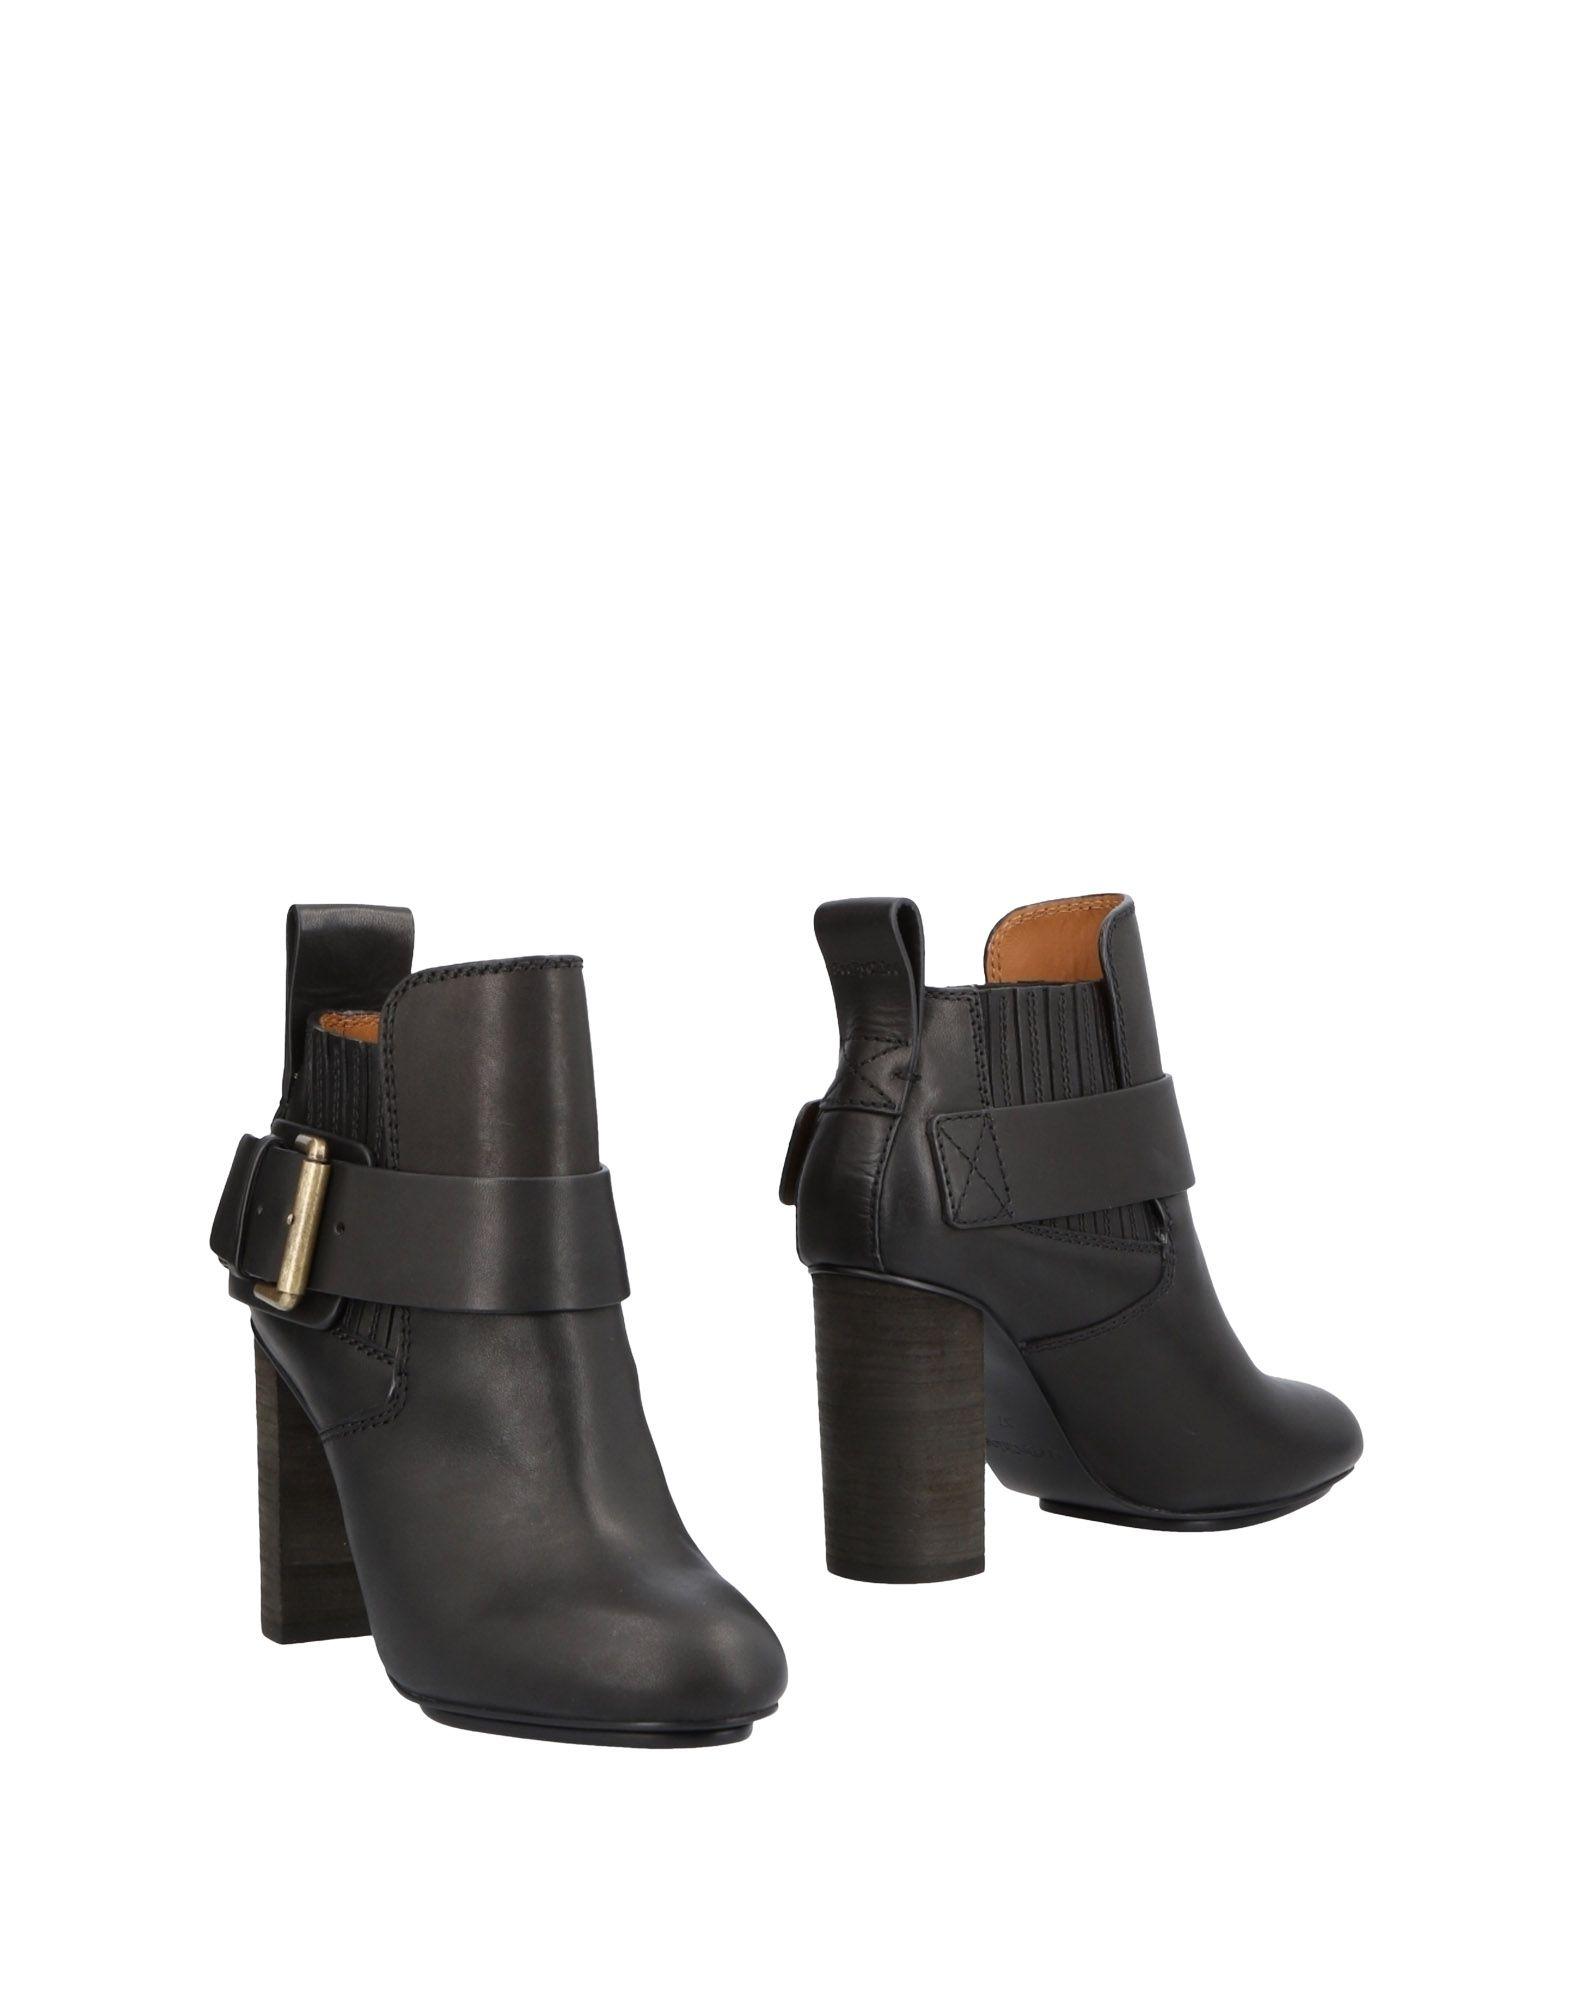 Rabatt Schuhe See By Chloé Stiefelette Damen  11483407OS